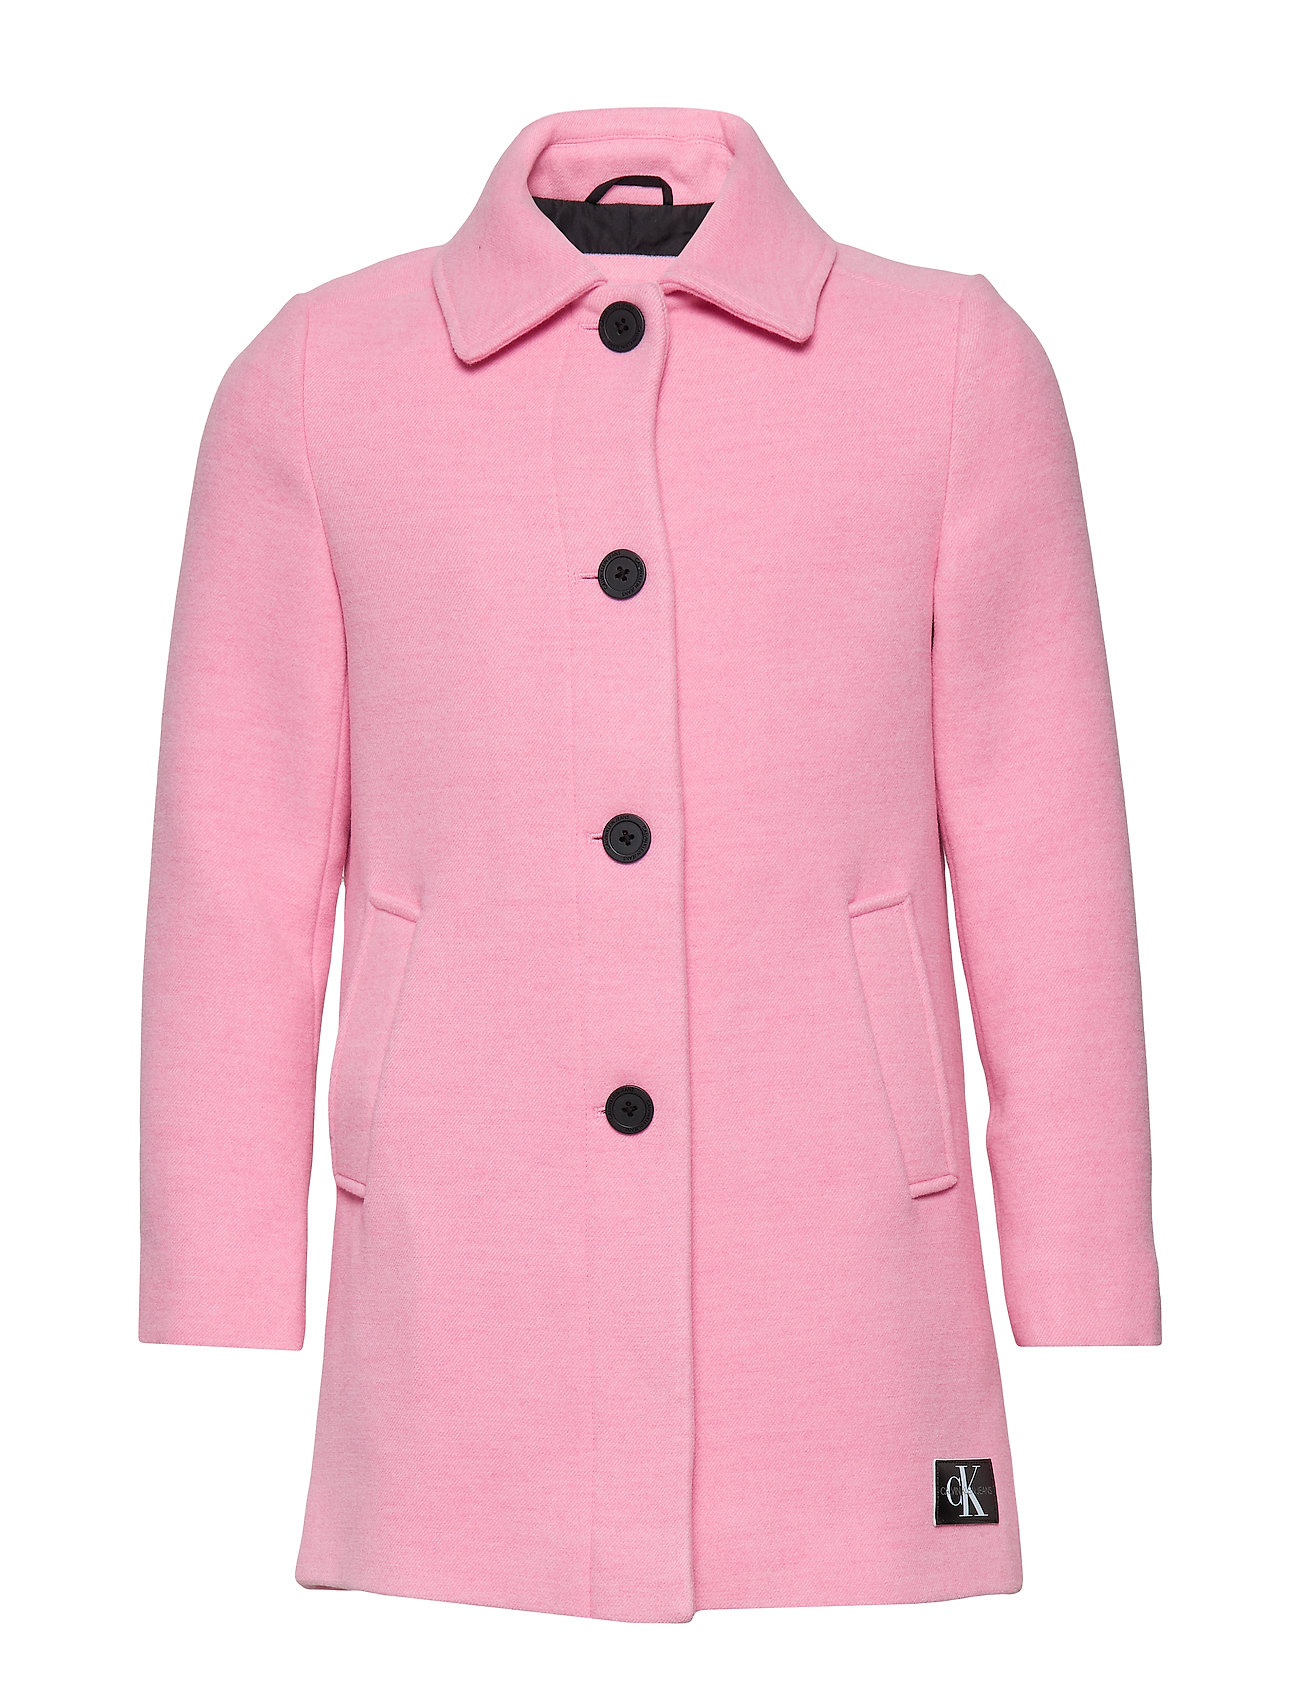 Calvin Klein A-LINE SHORT COAT GI - BEGONIA PINK